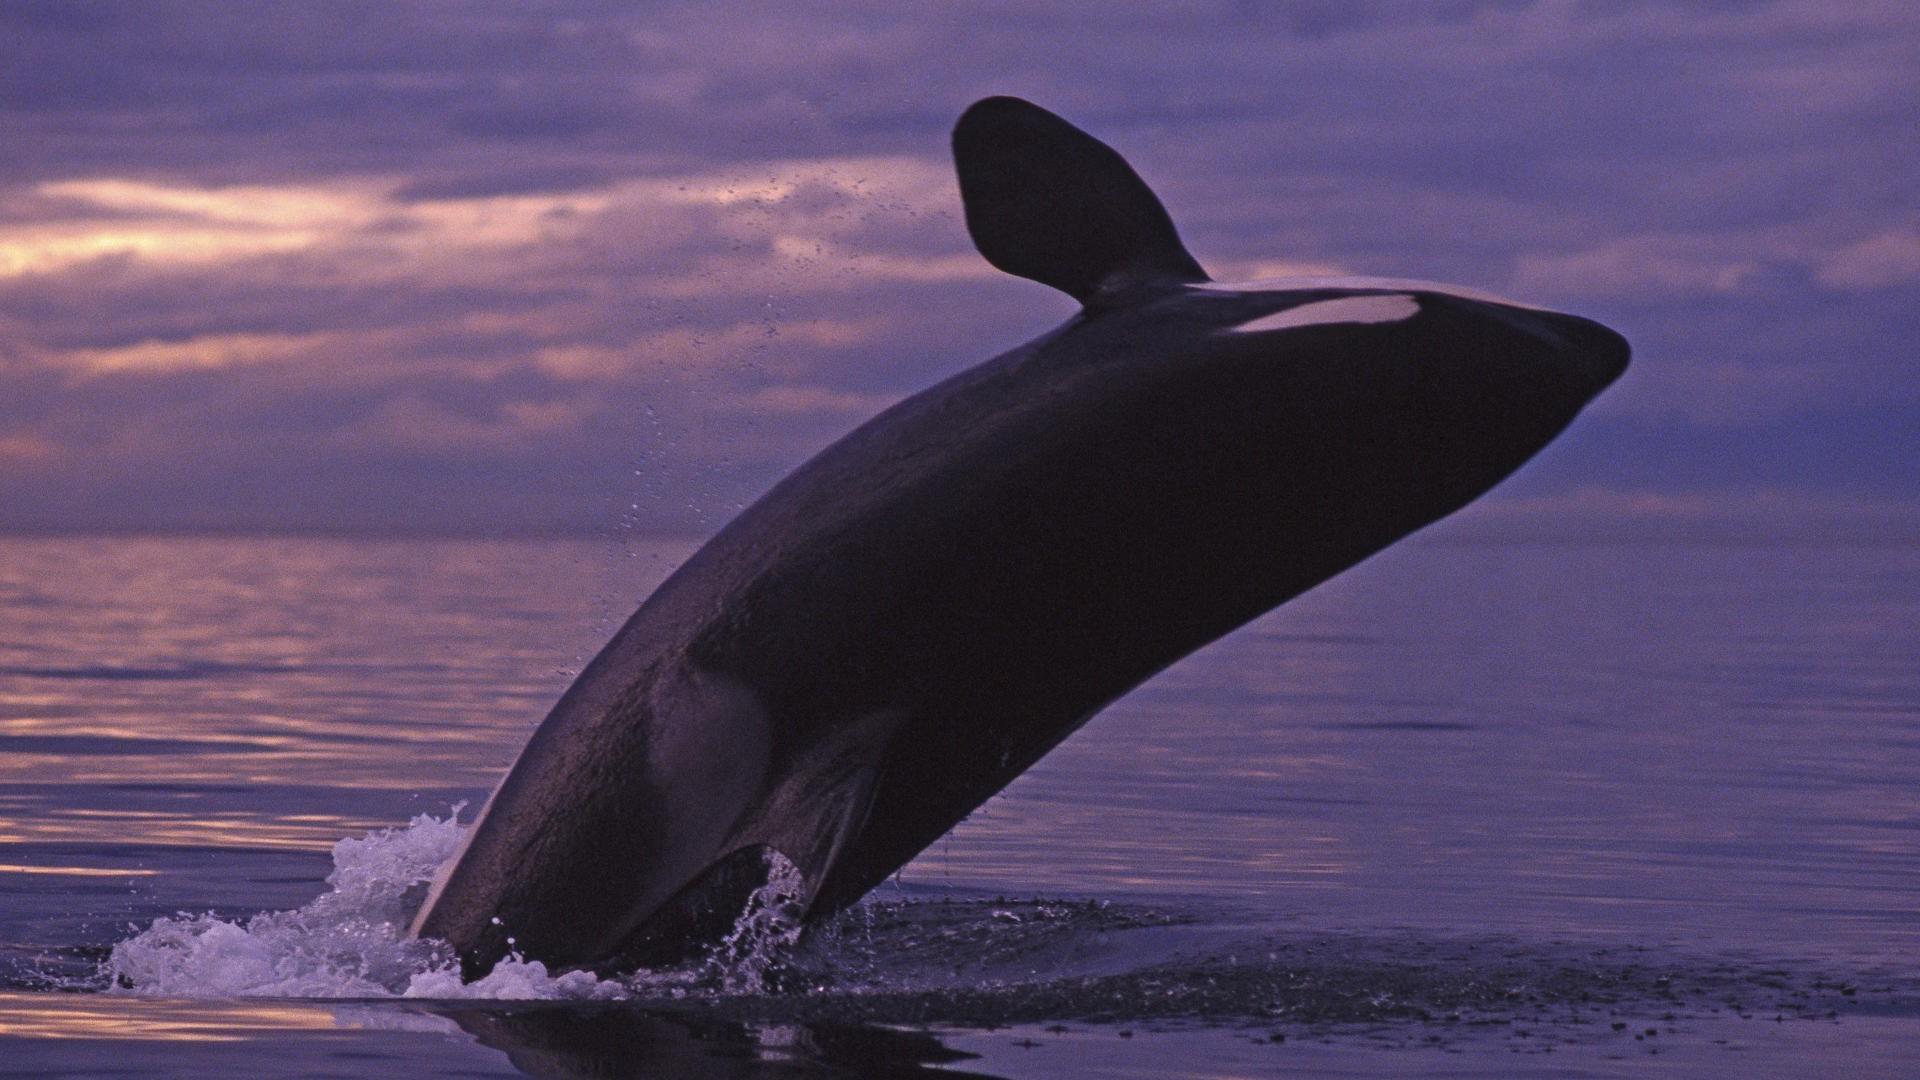 Картинки моря и китов